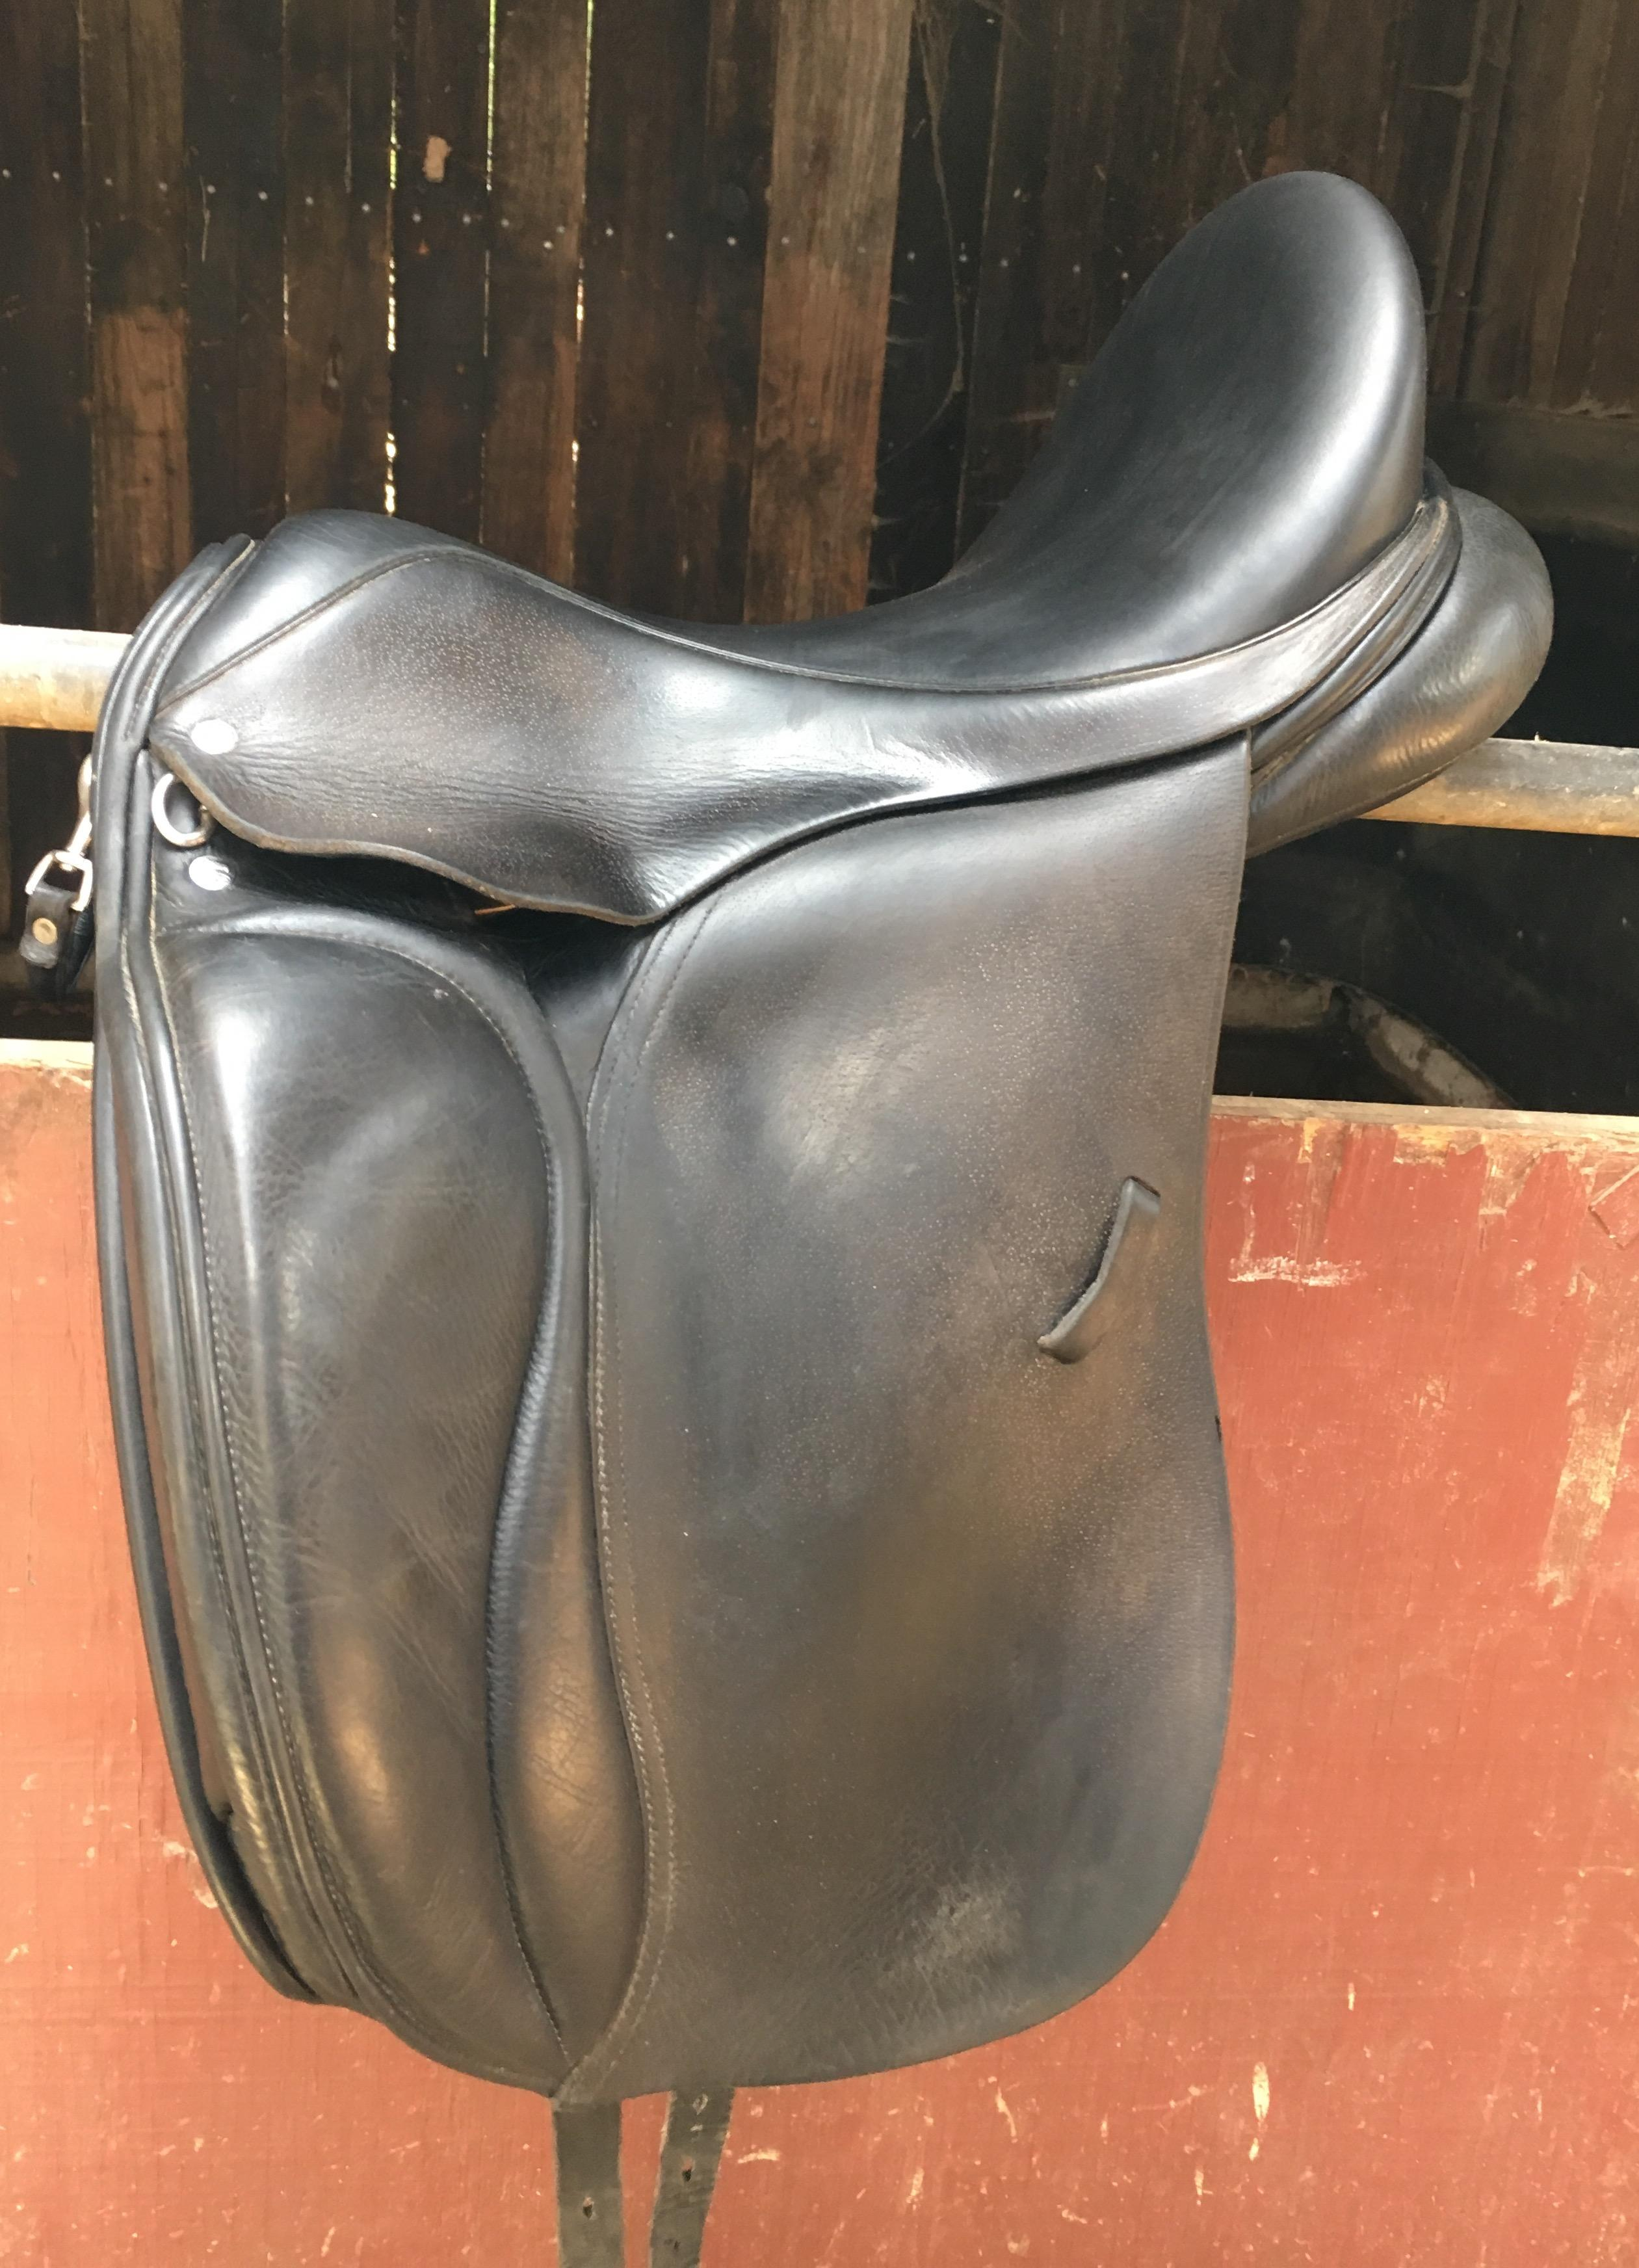 Loxley Bliss Dressage saddle